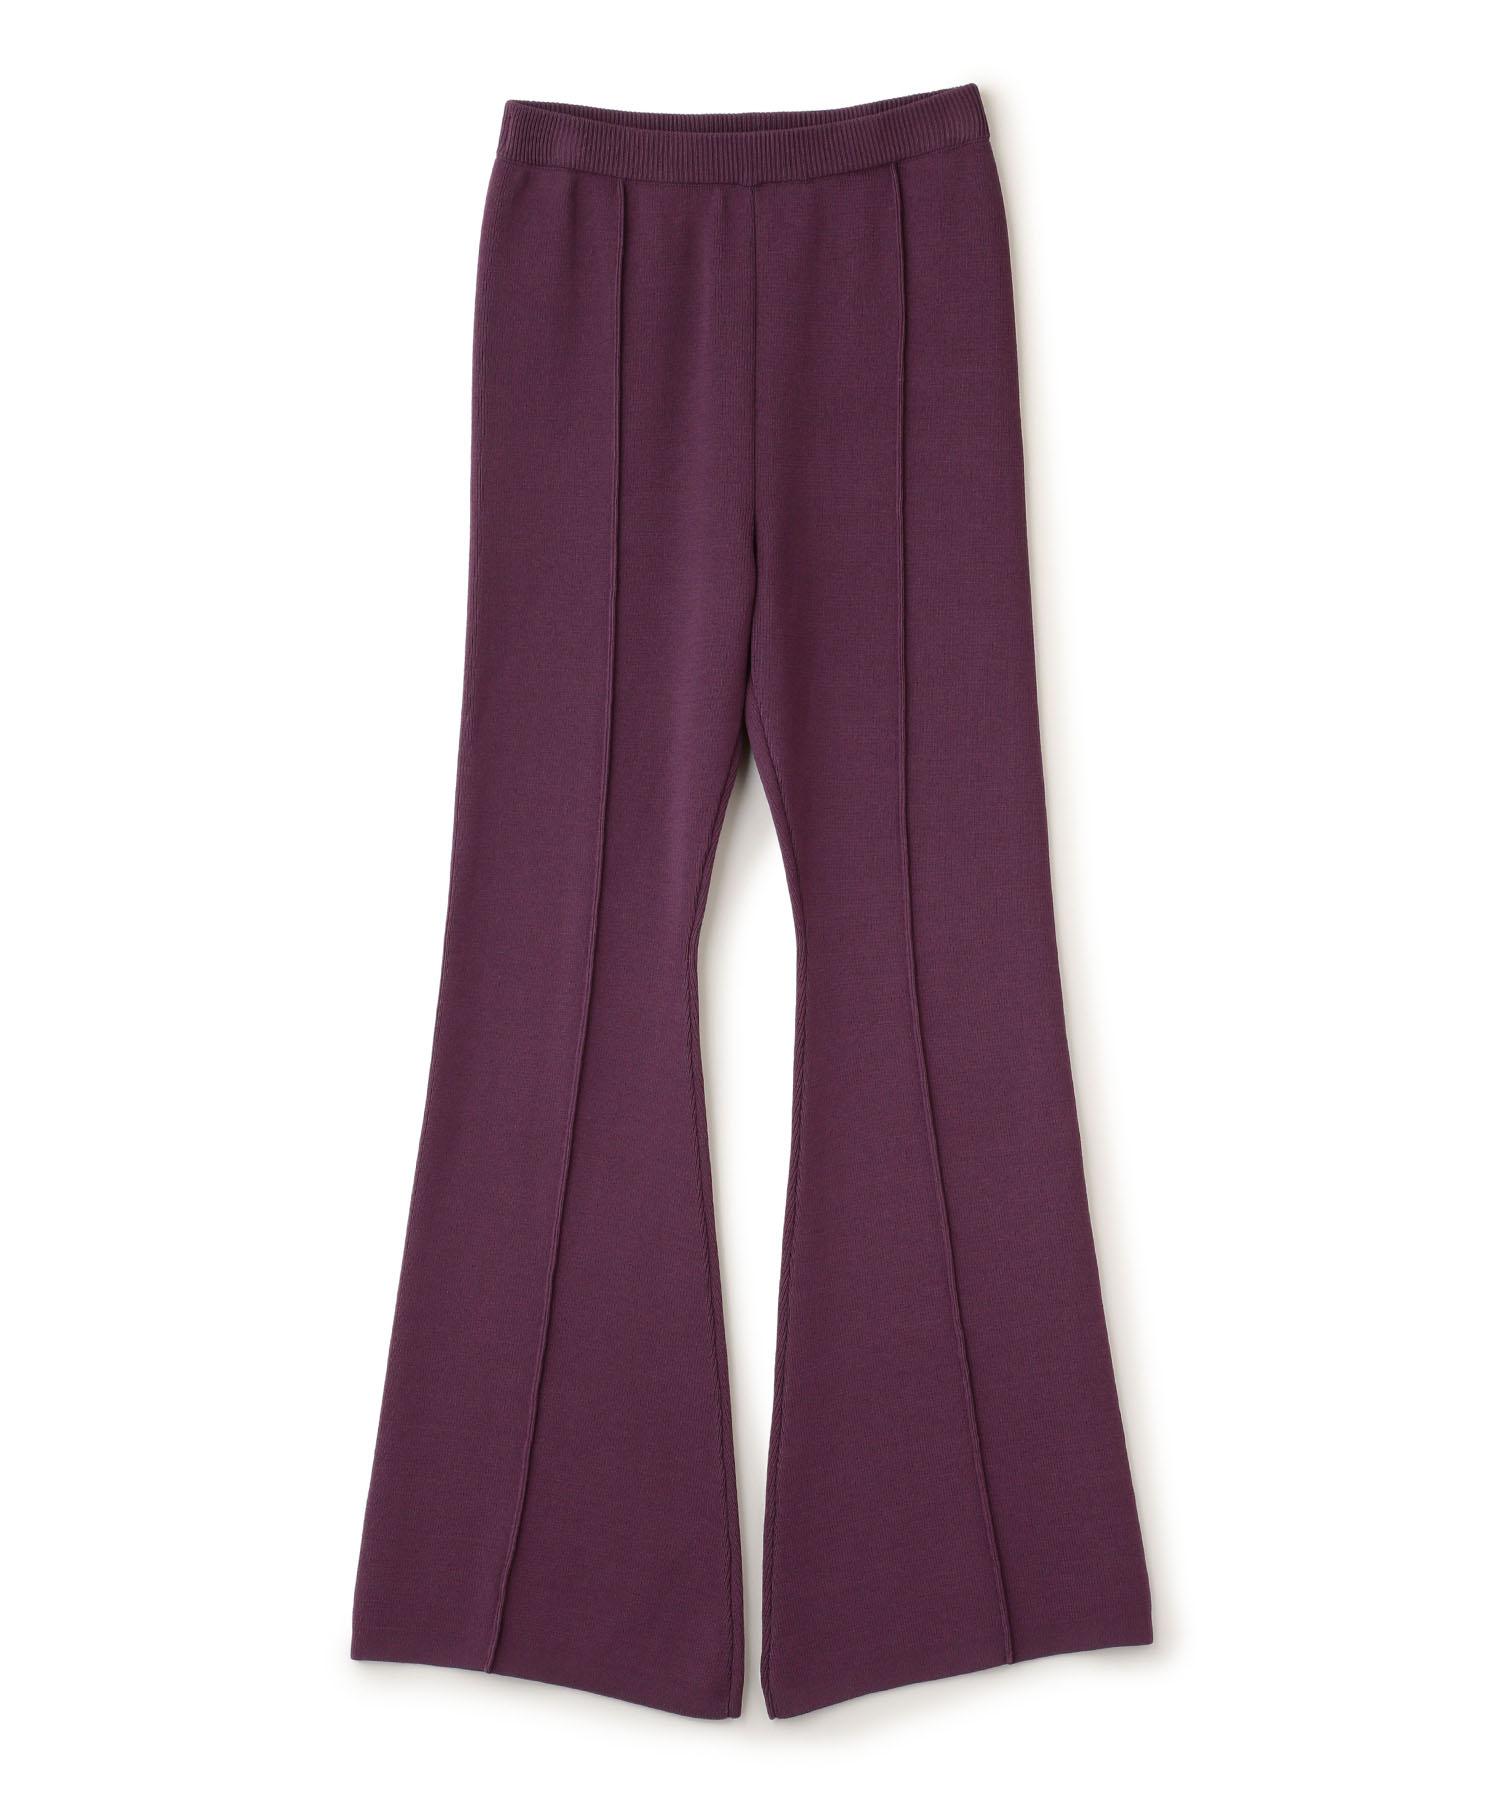 Bell Bottom Knit Pants